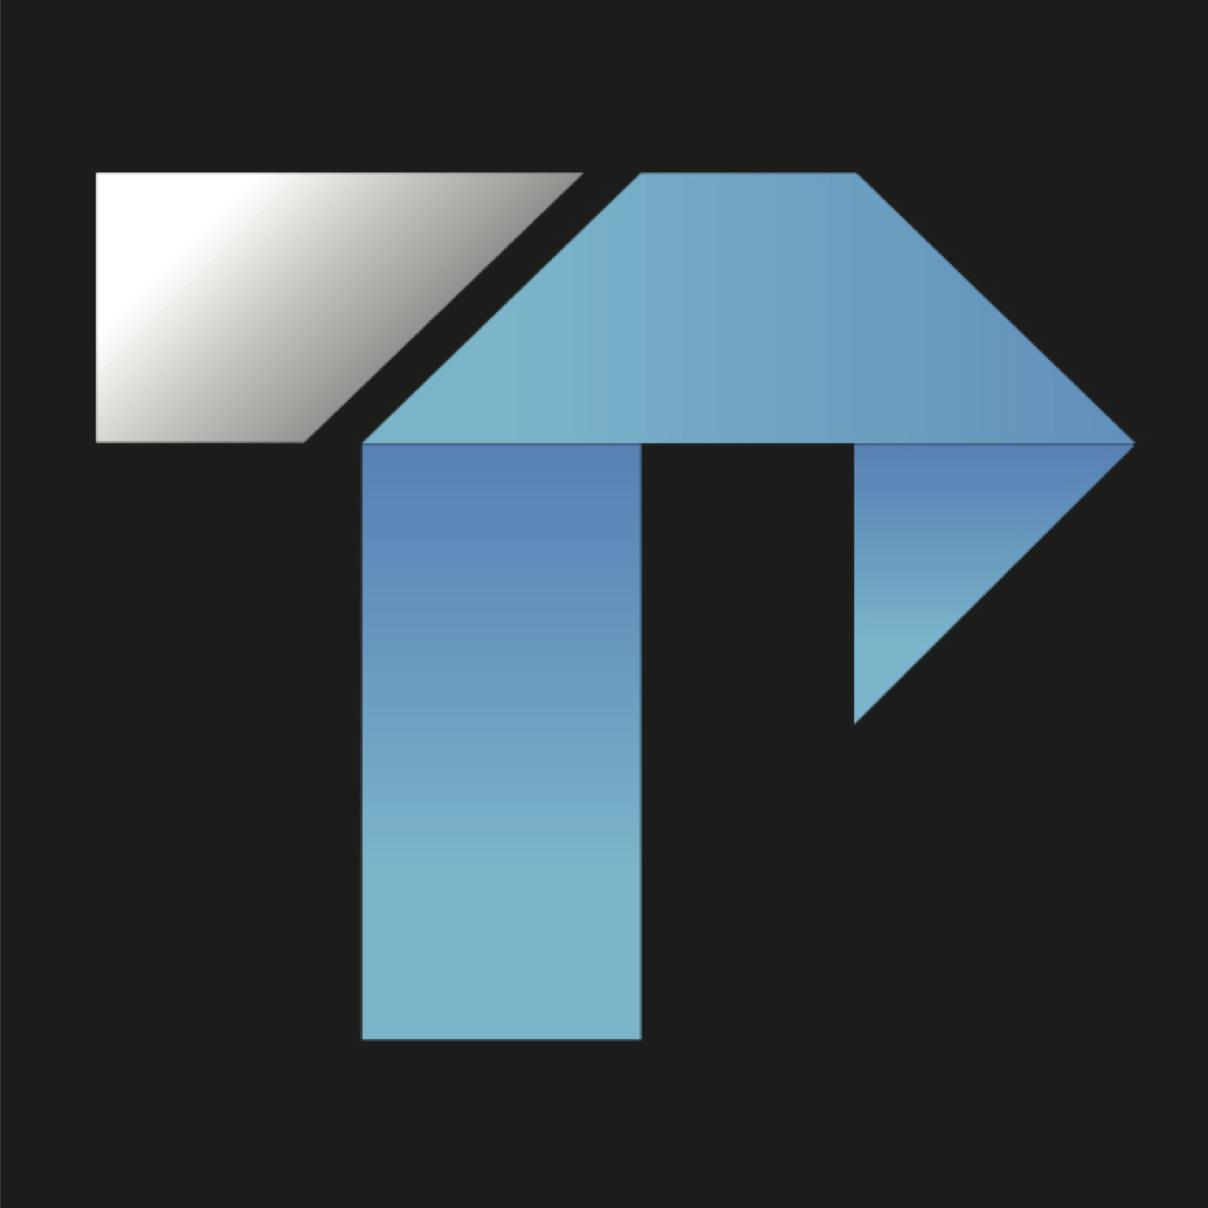 Touchplaniconblack